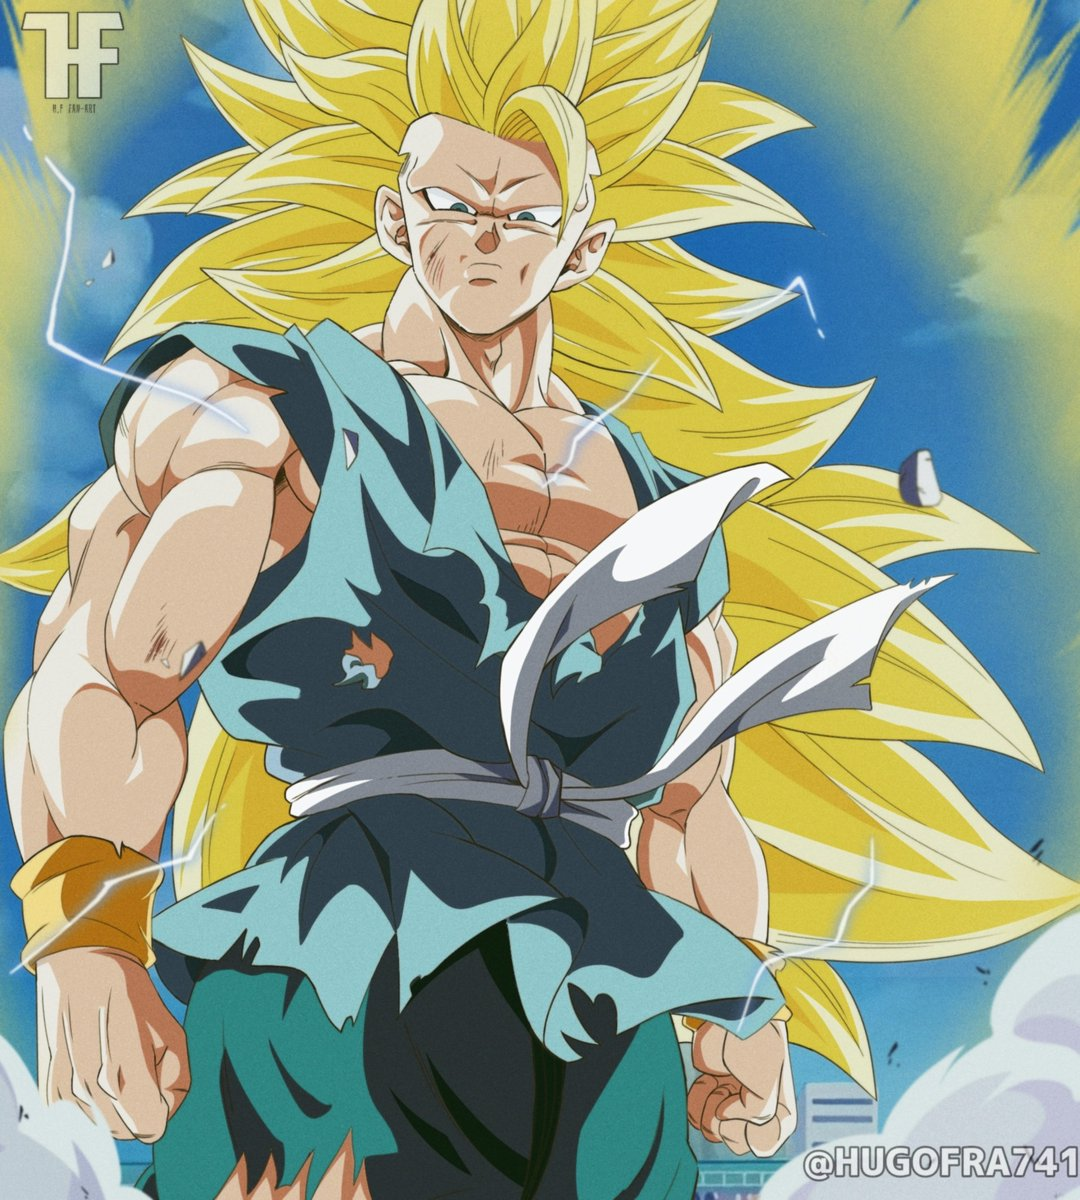 Goku ssj3 with the suit of the final part of the series #Goku #dragonballz #DragonBallSuper #dragonballgt #DragonBall